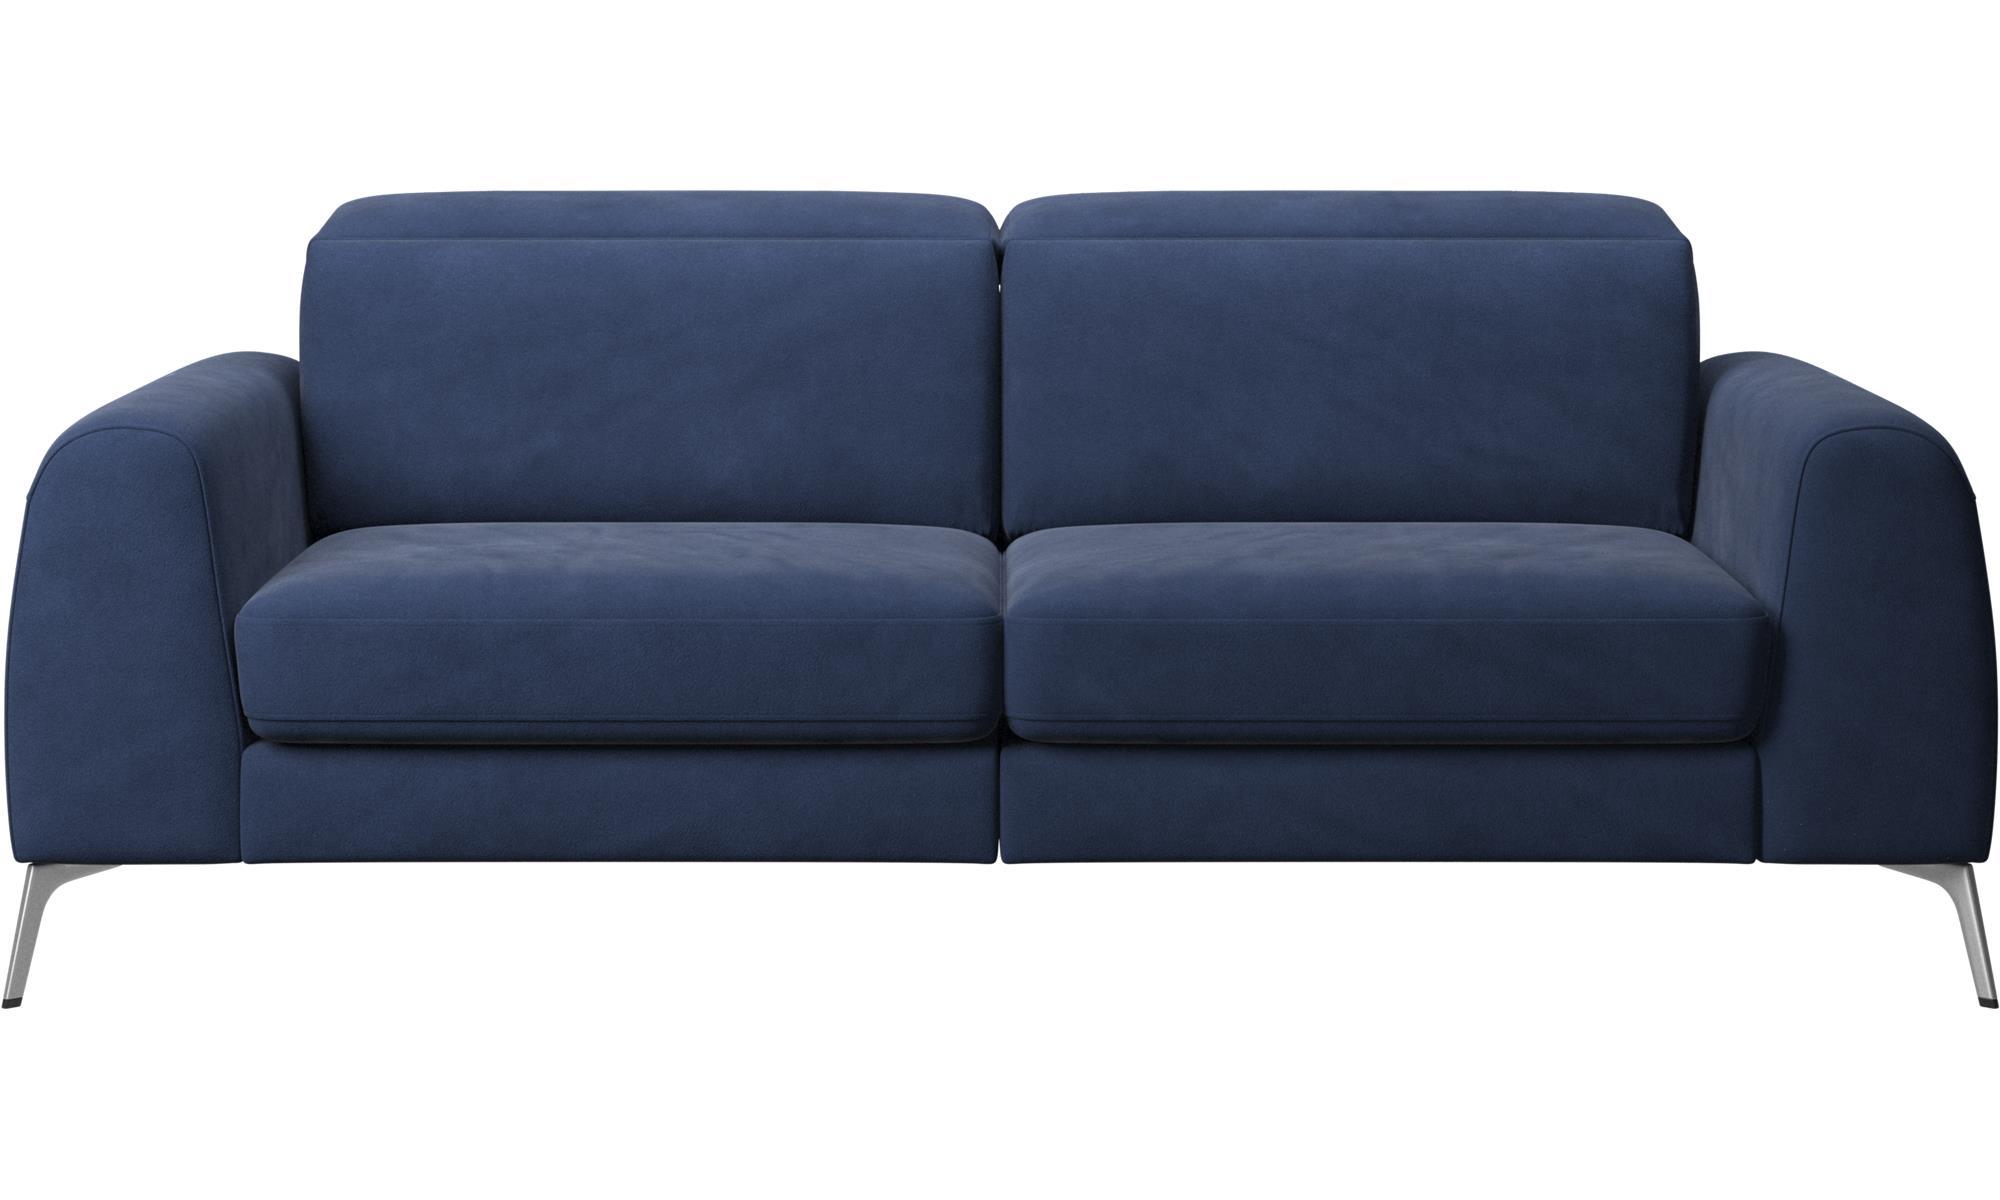 schlafsofas madison schlafsofa mit verstellbarer. Black Bedroom Furniture Sets. Home Design Ideas